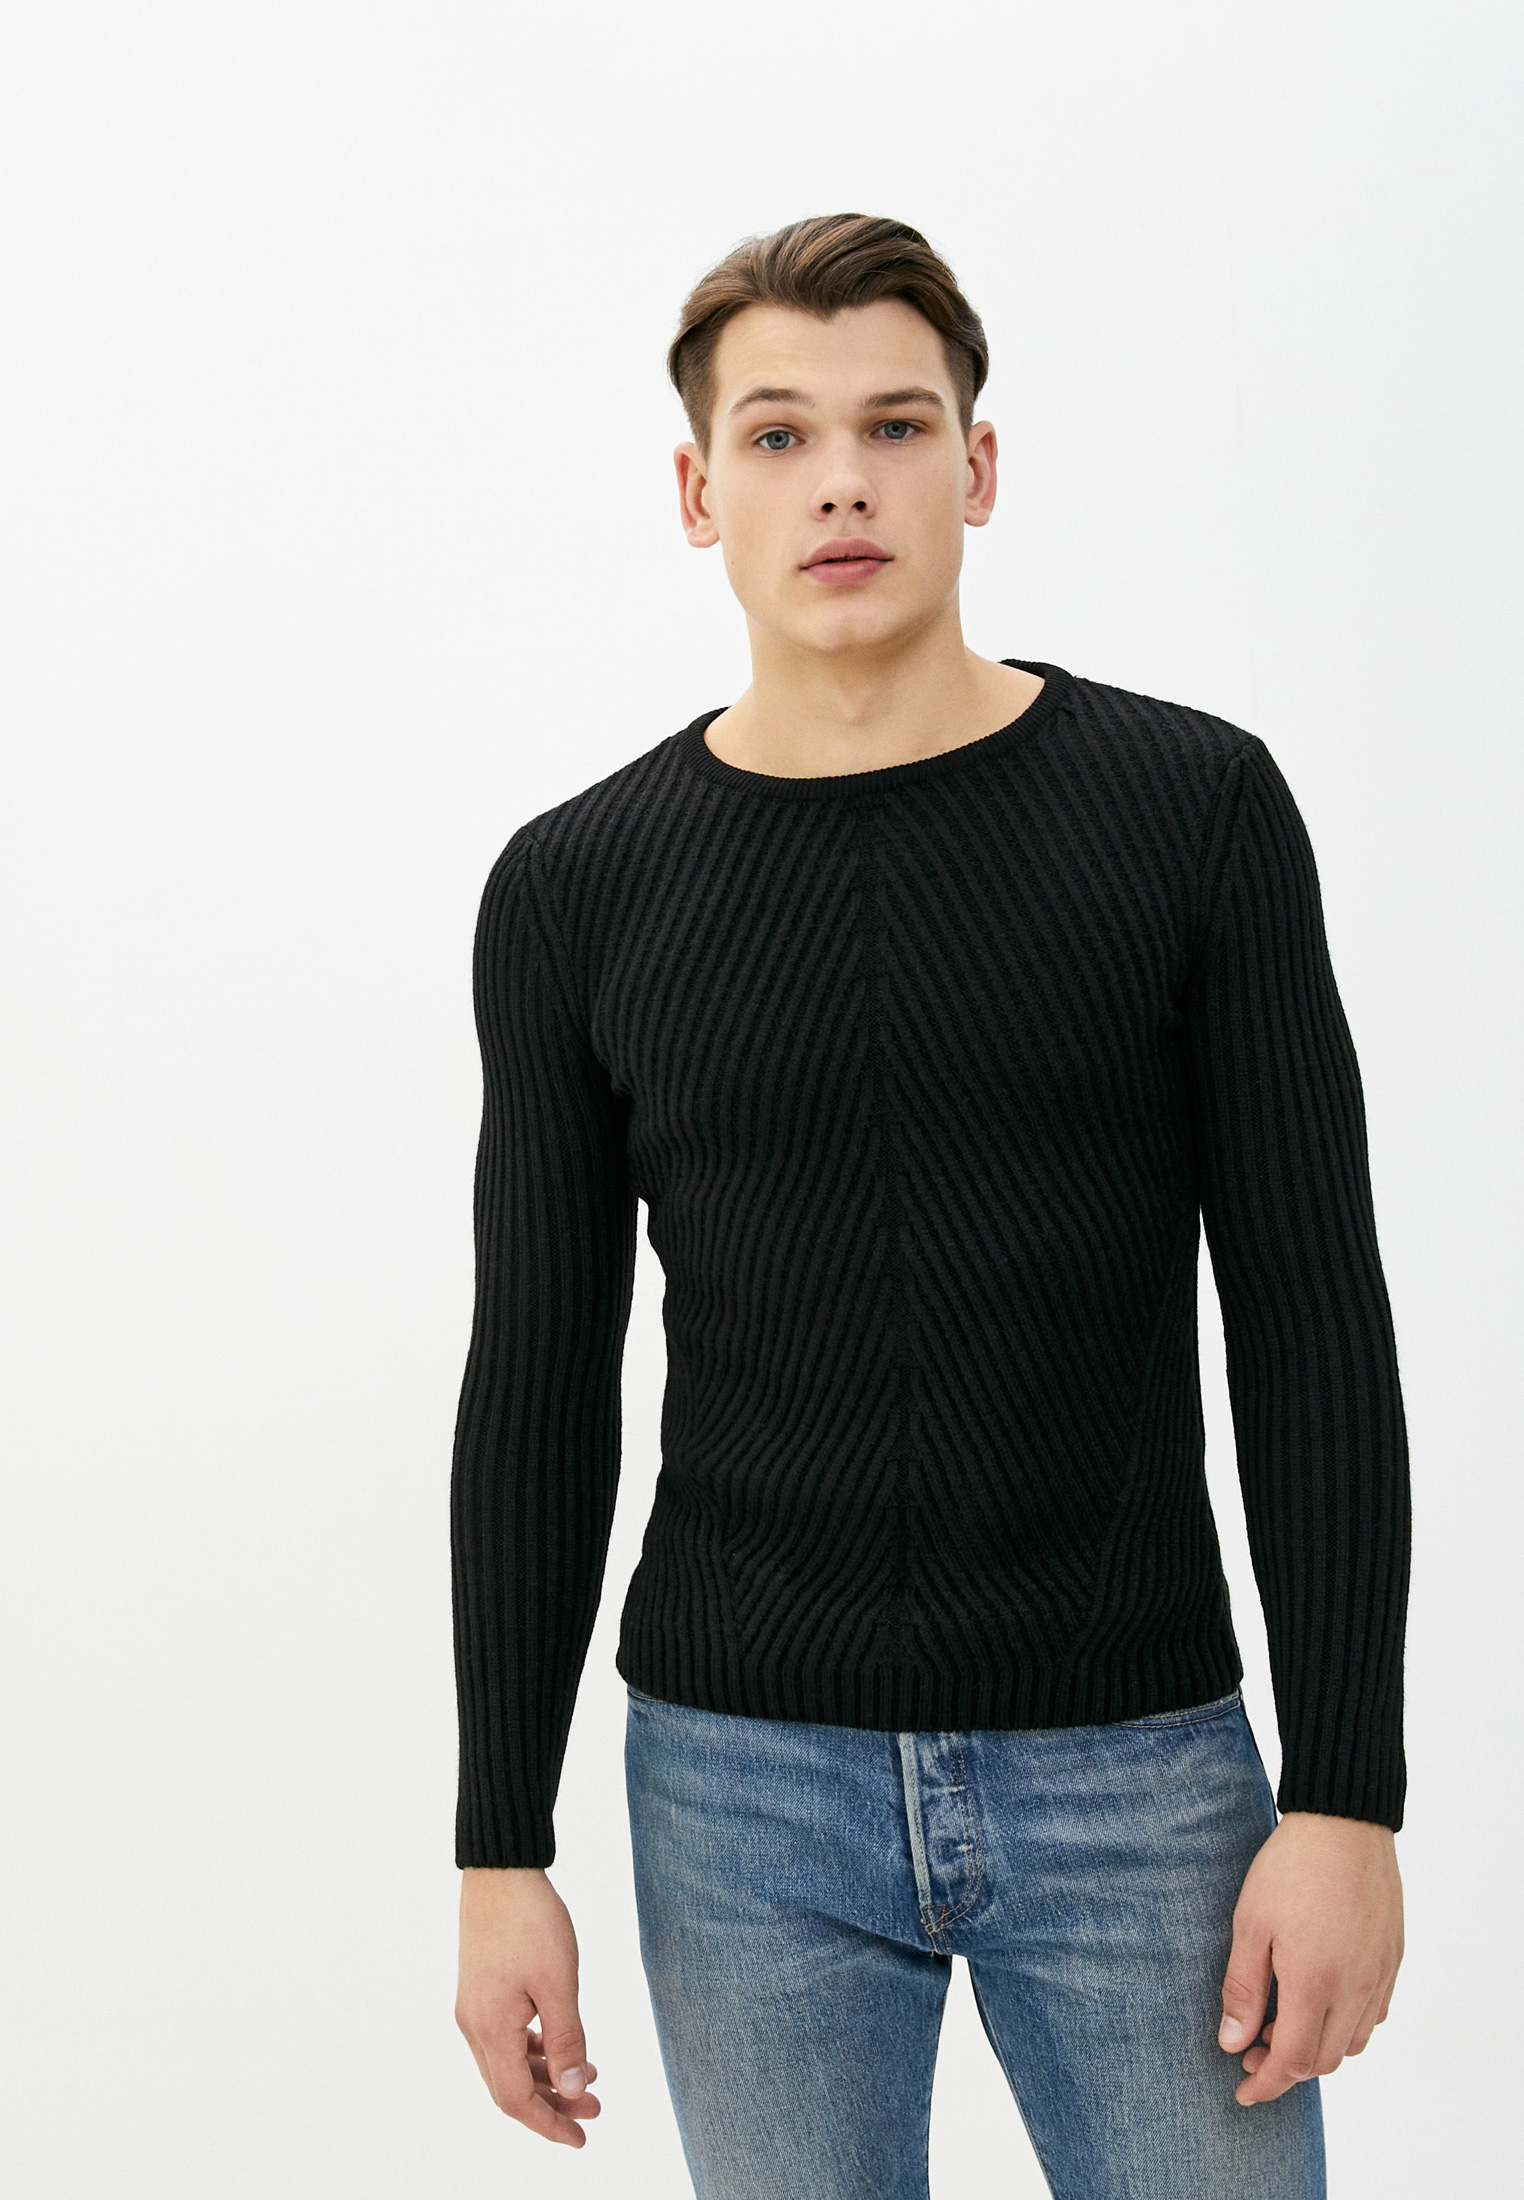 Мужская одежда Dali 2461